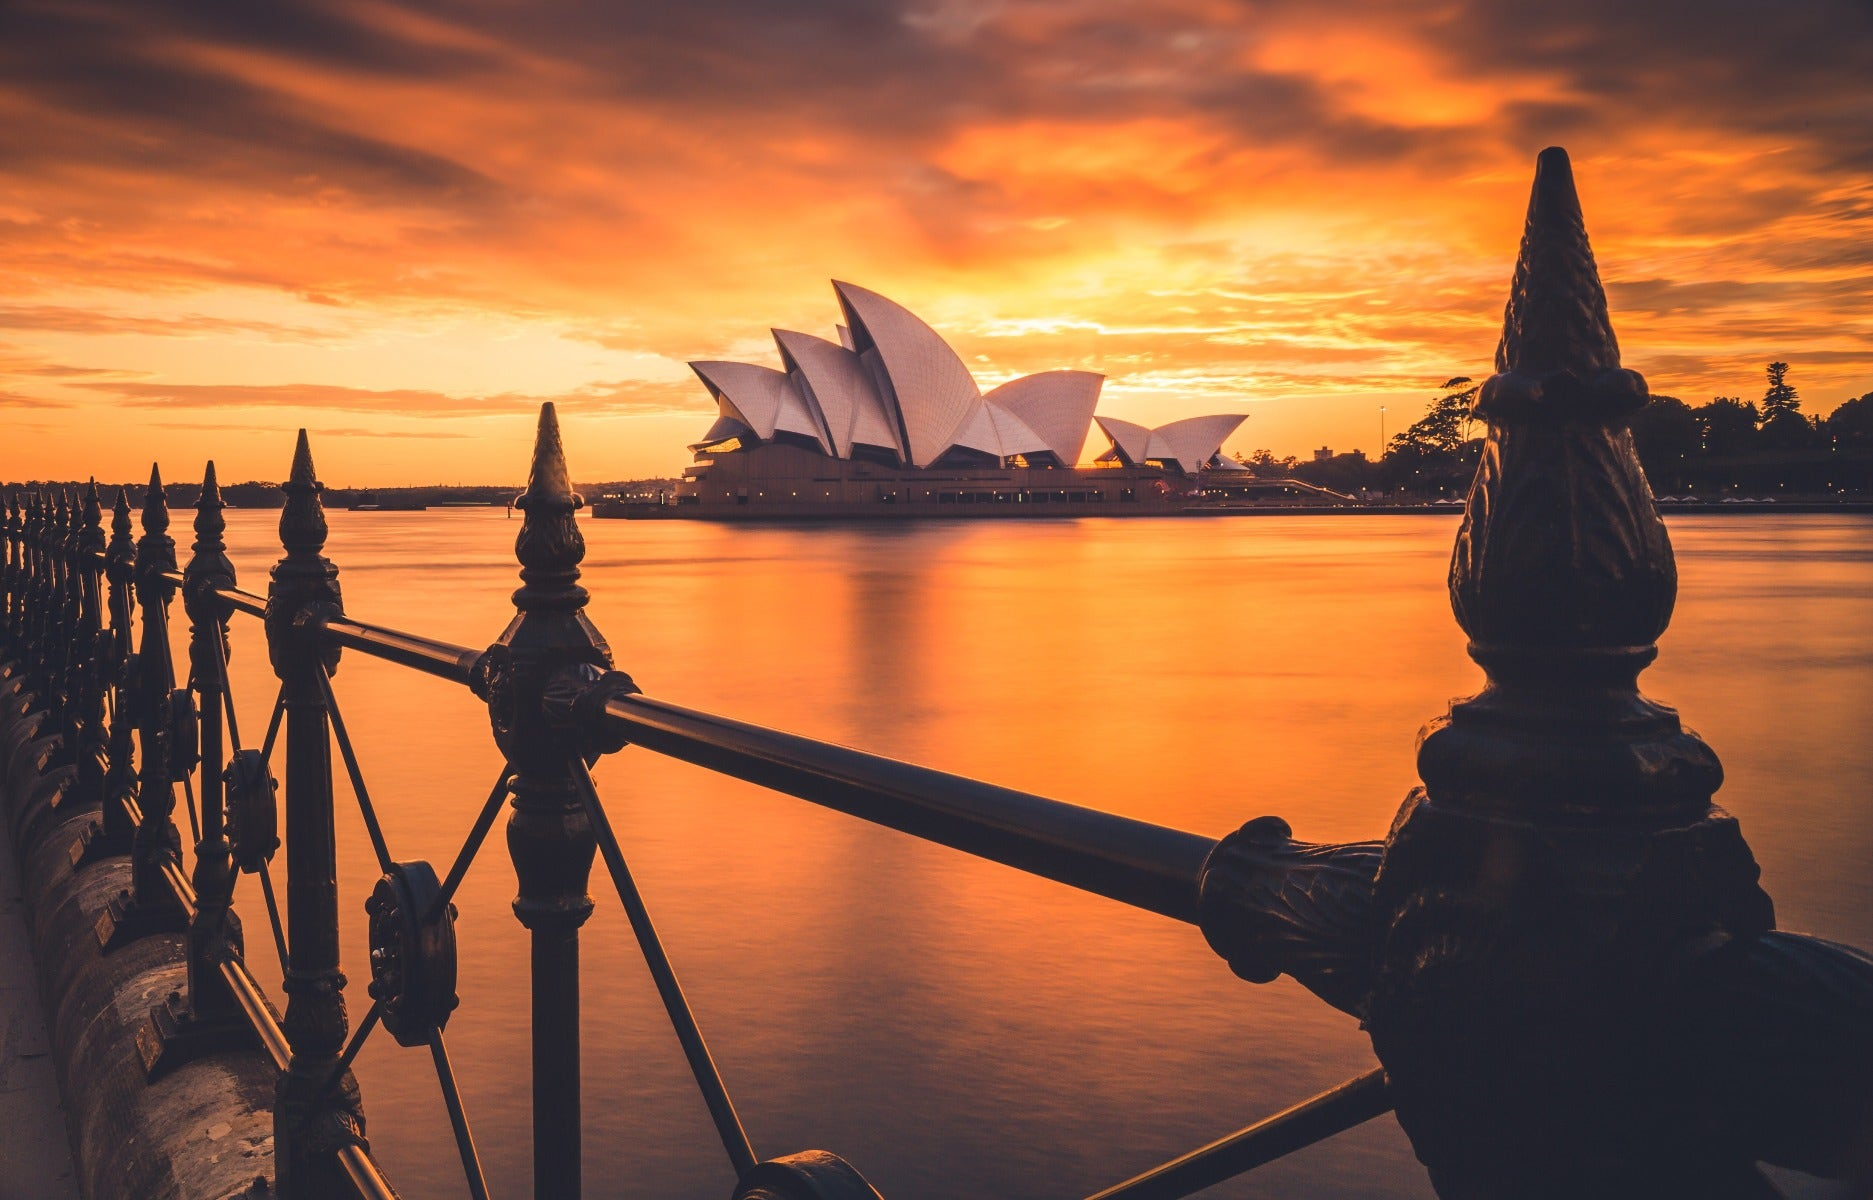 Sydney Opera House with polarising filter at sunset